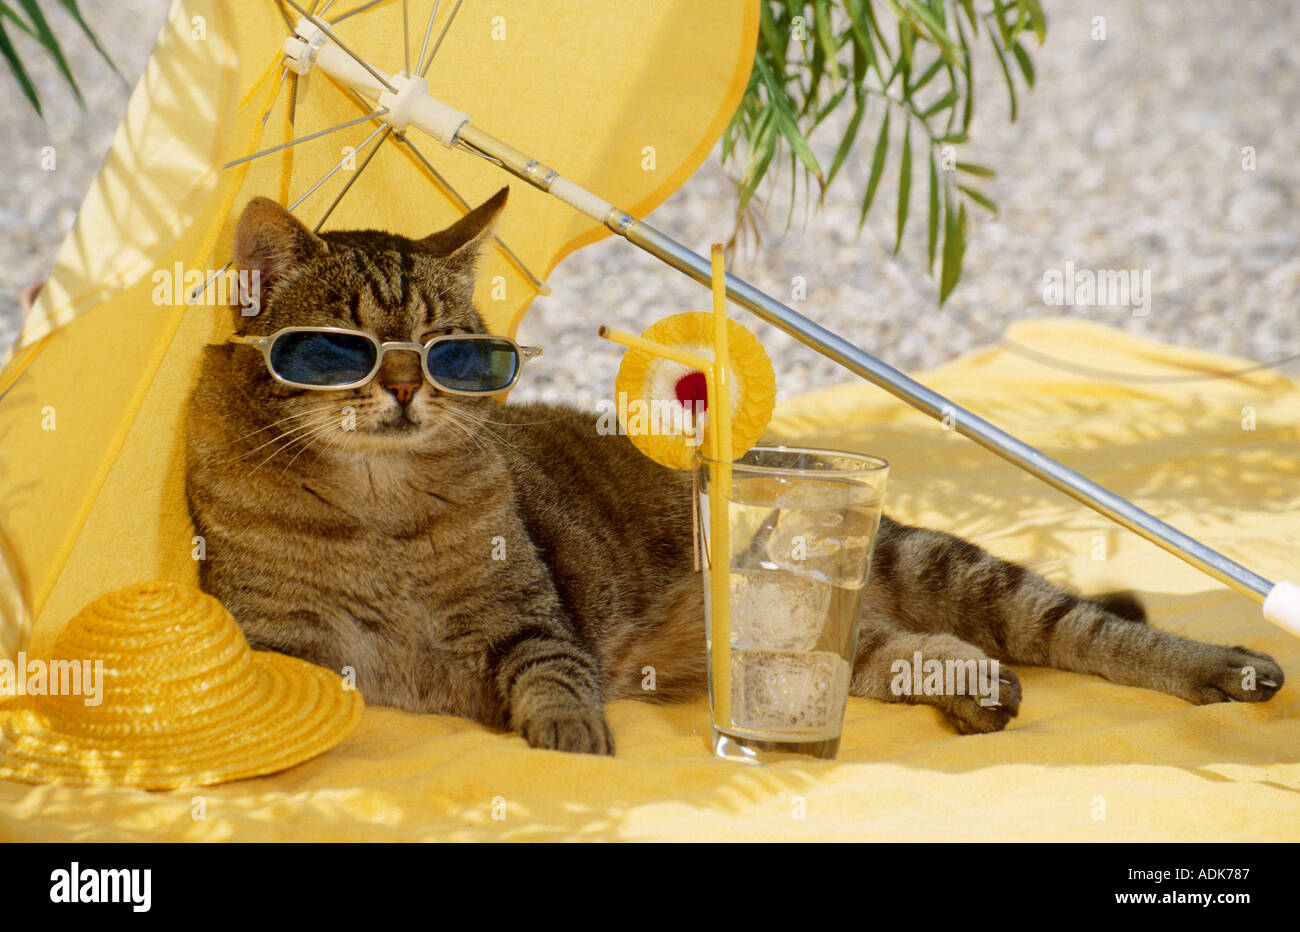 Почему кошка и котенок убегали от чака выпишите предложения